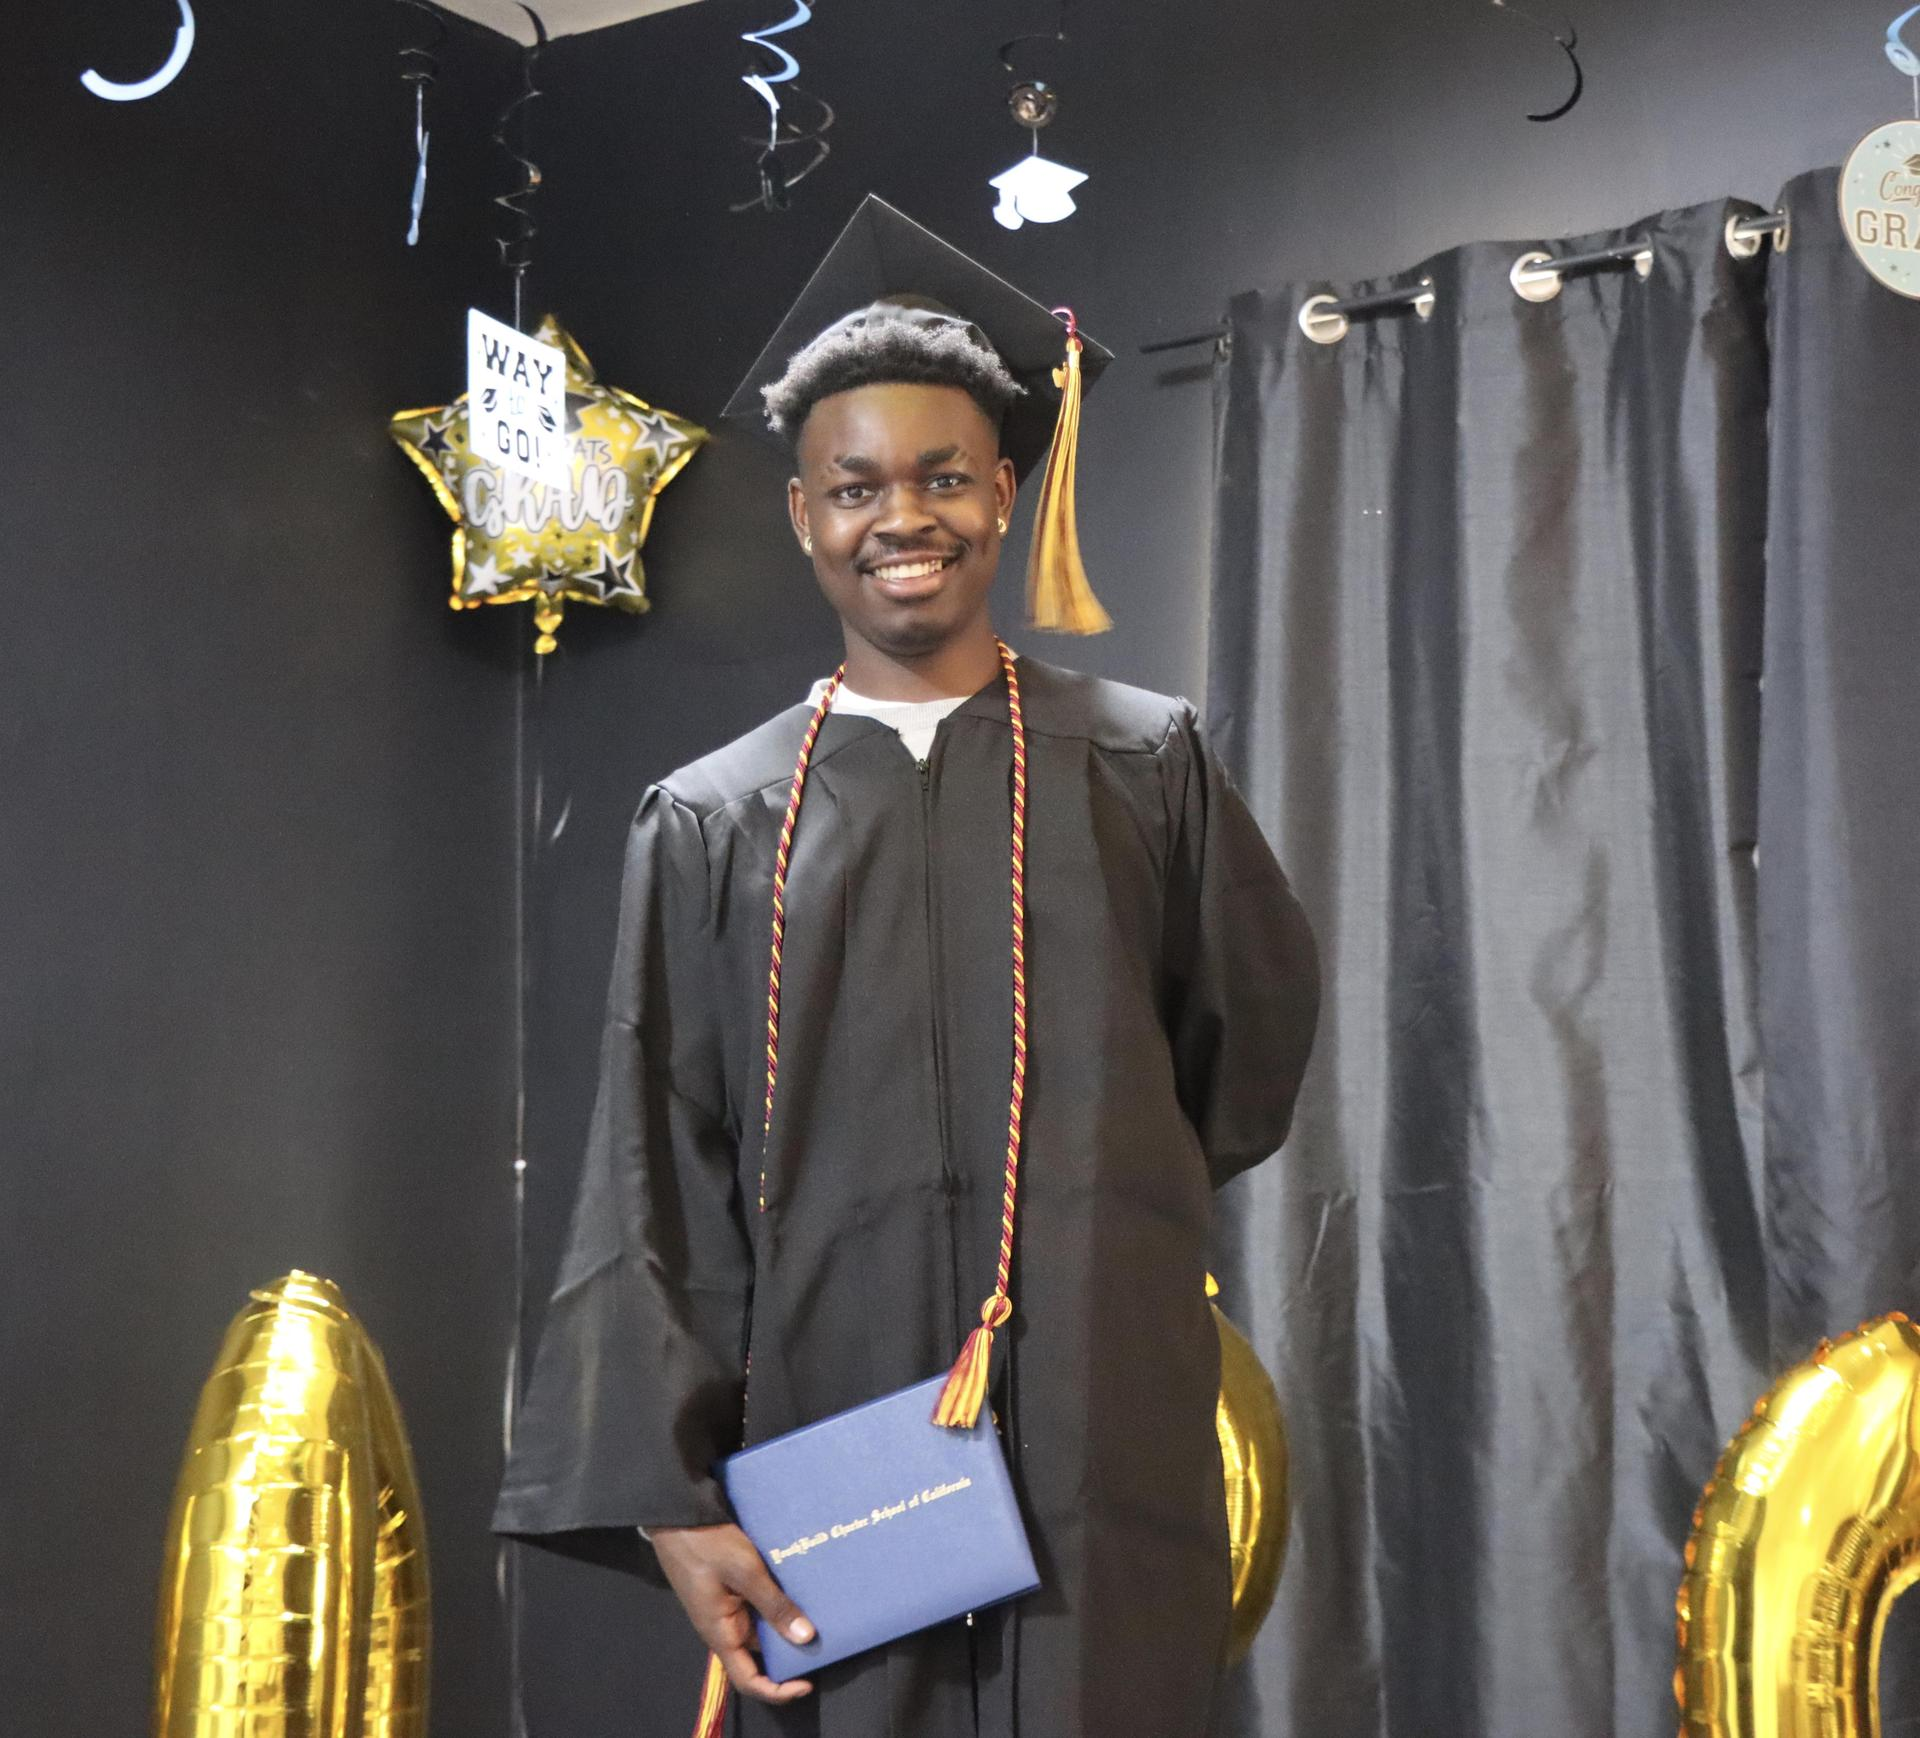 A 2020 Hollywood site graduate